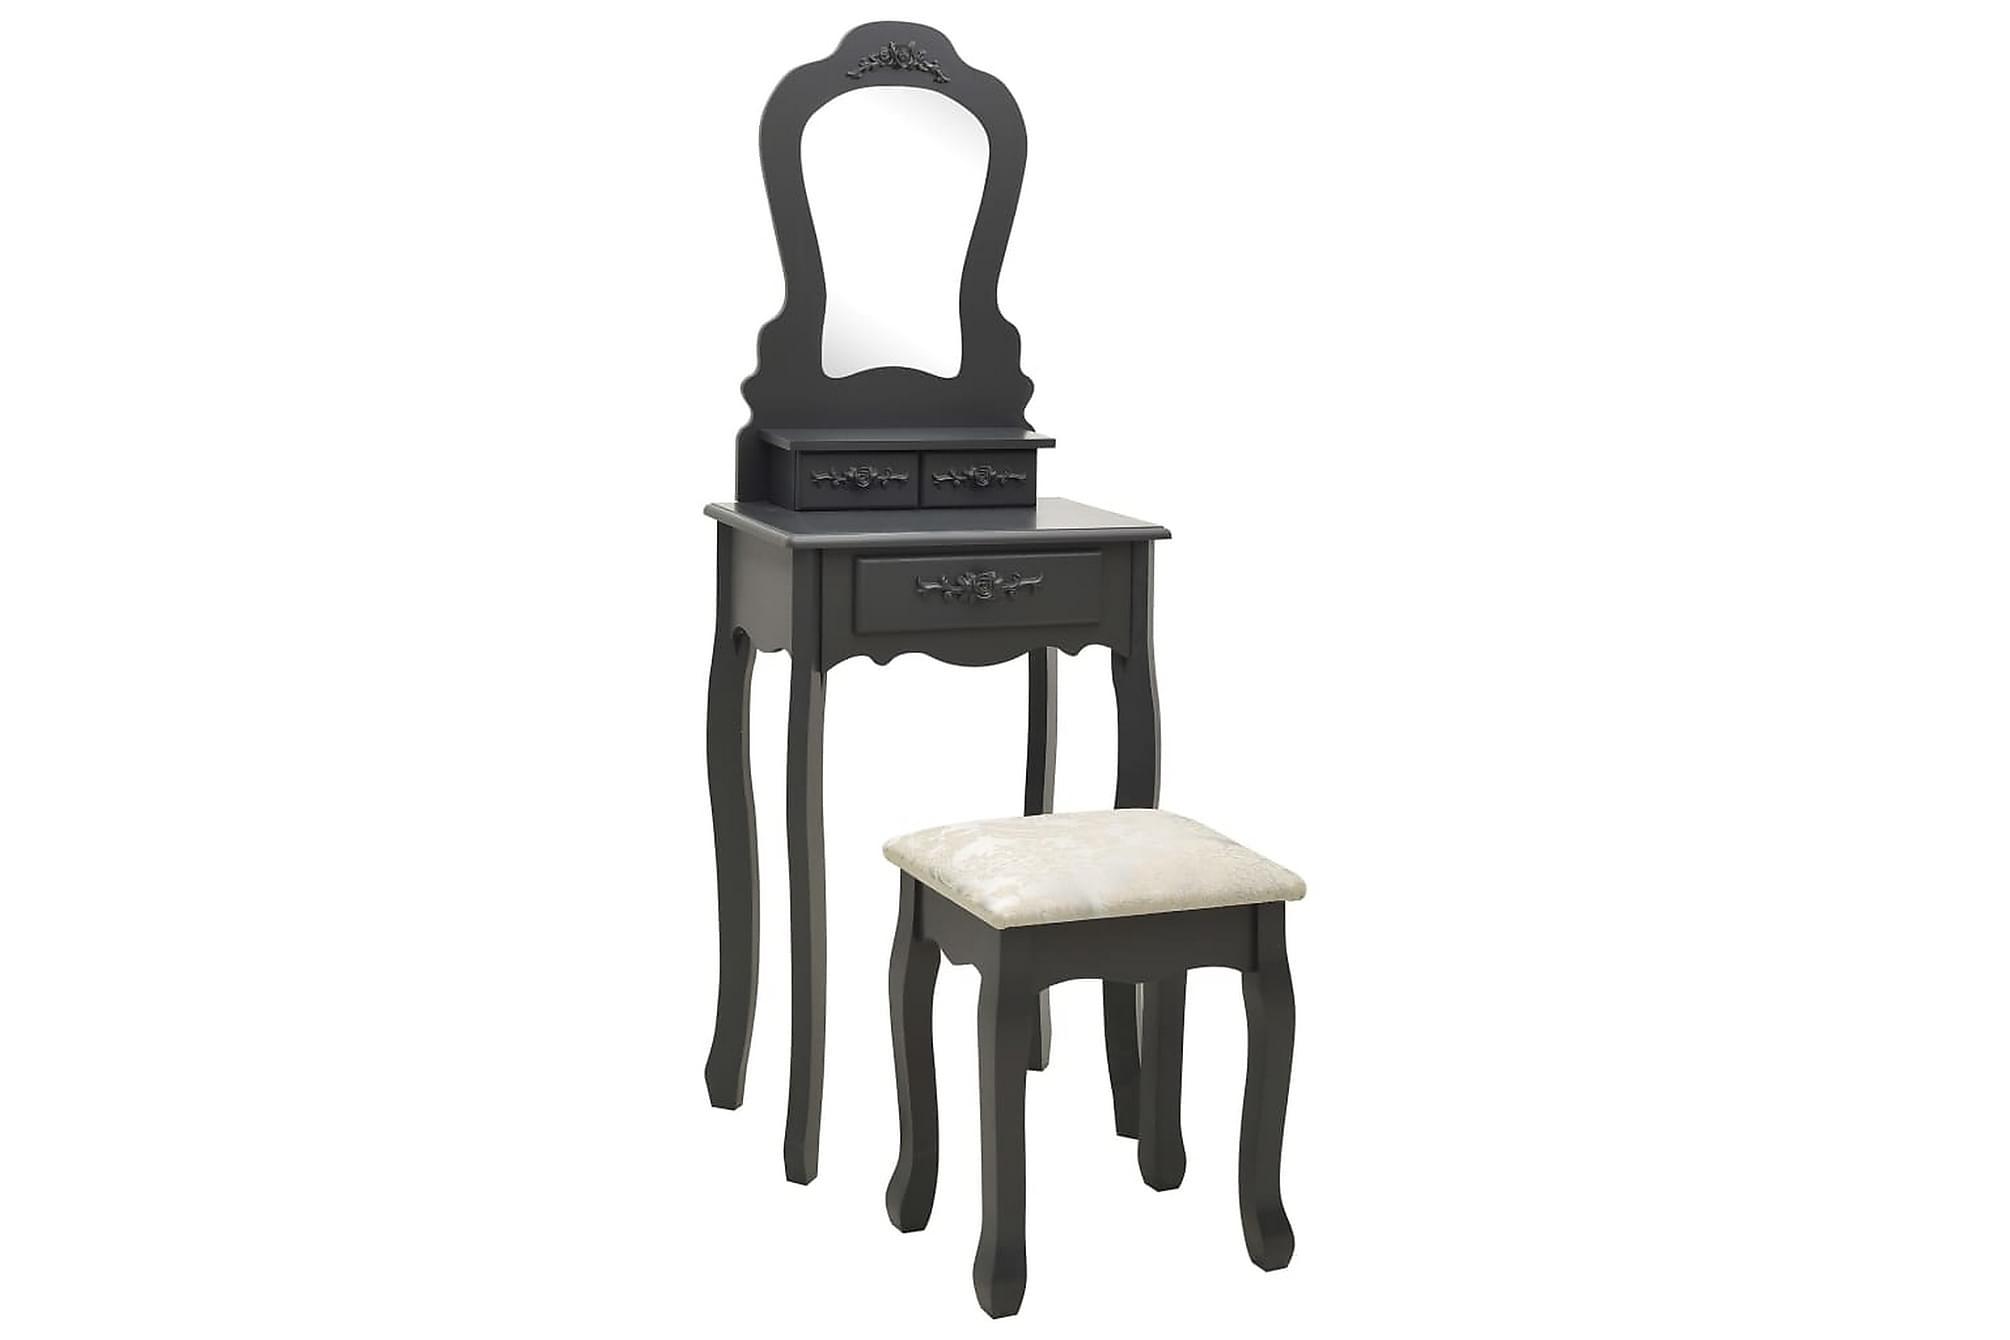 Sminkbord med pall grå 50x59x136 cm paulowniaträ, Sminkbord